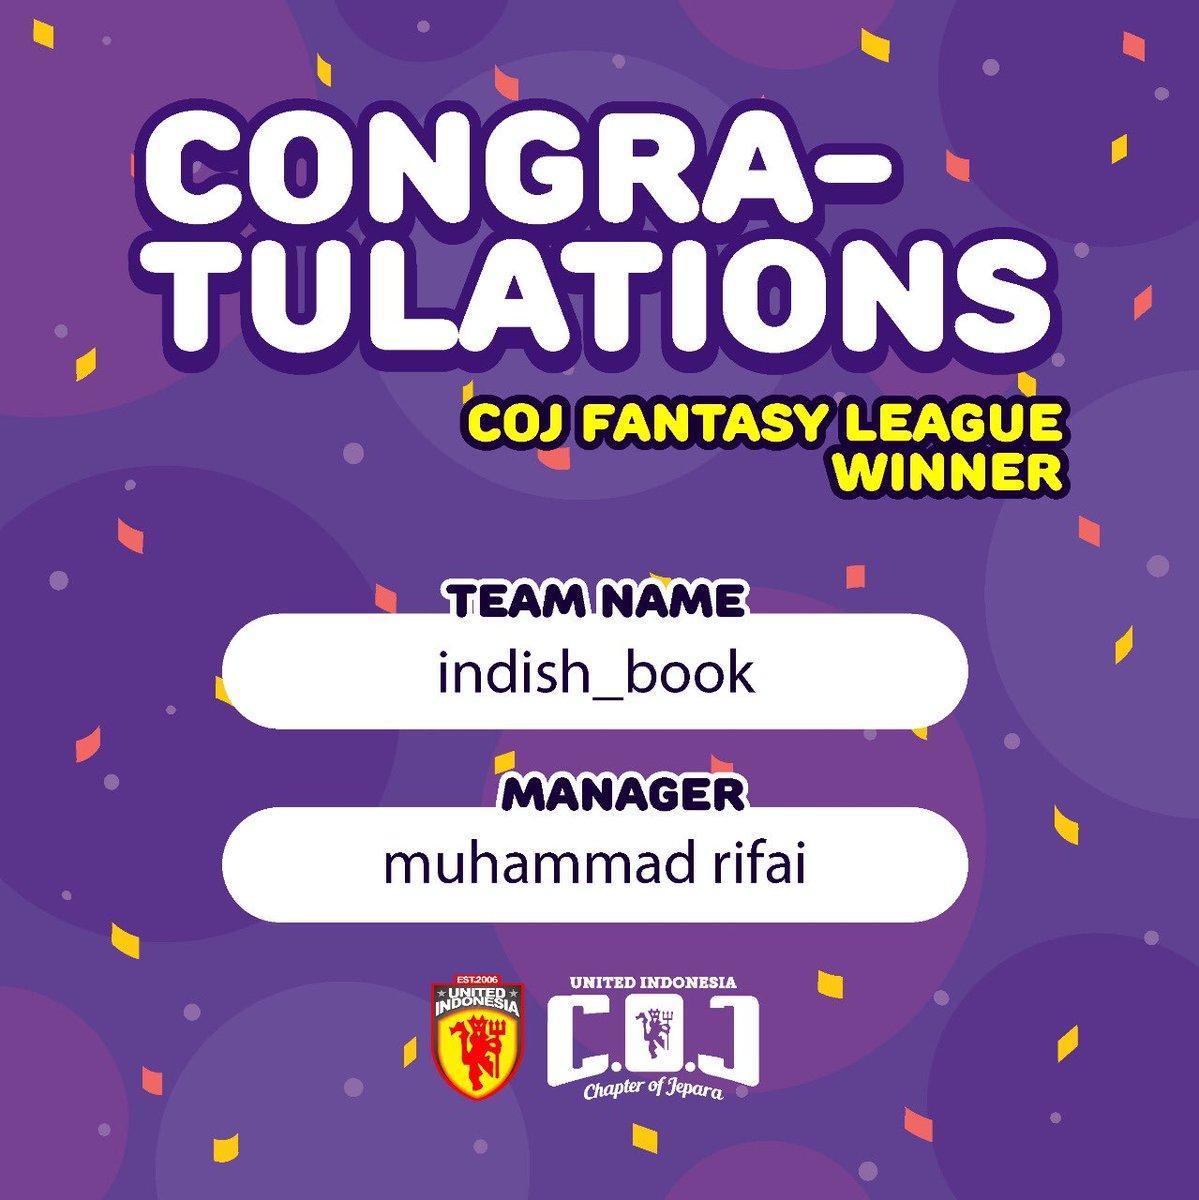 Selamat kami ucapkan untuk pemenang COJ Fantasy League 2018/2019. Silahkan kirim nama, alamat dan Nomor hp ke mimin ya untuk pengiriman hadiah. Untuk yang belom beruntung kita main lagi musim depan ya 😊  #UnitedIndonesiaJepara #UnitedIndonesia #UnitedTogether #UnityForUnited